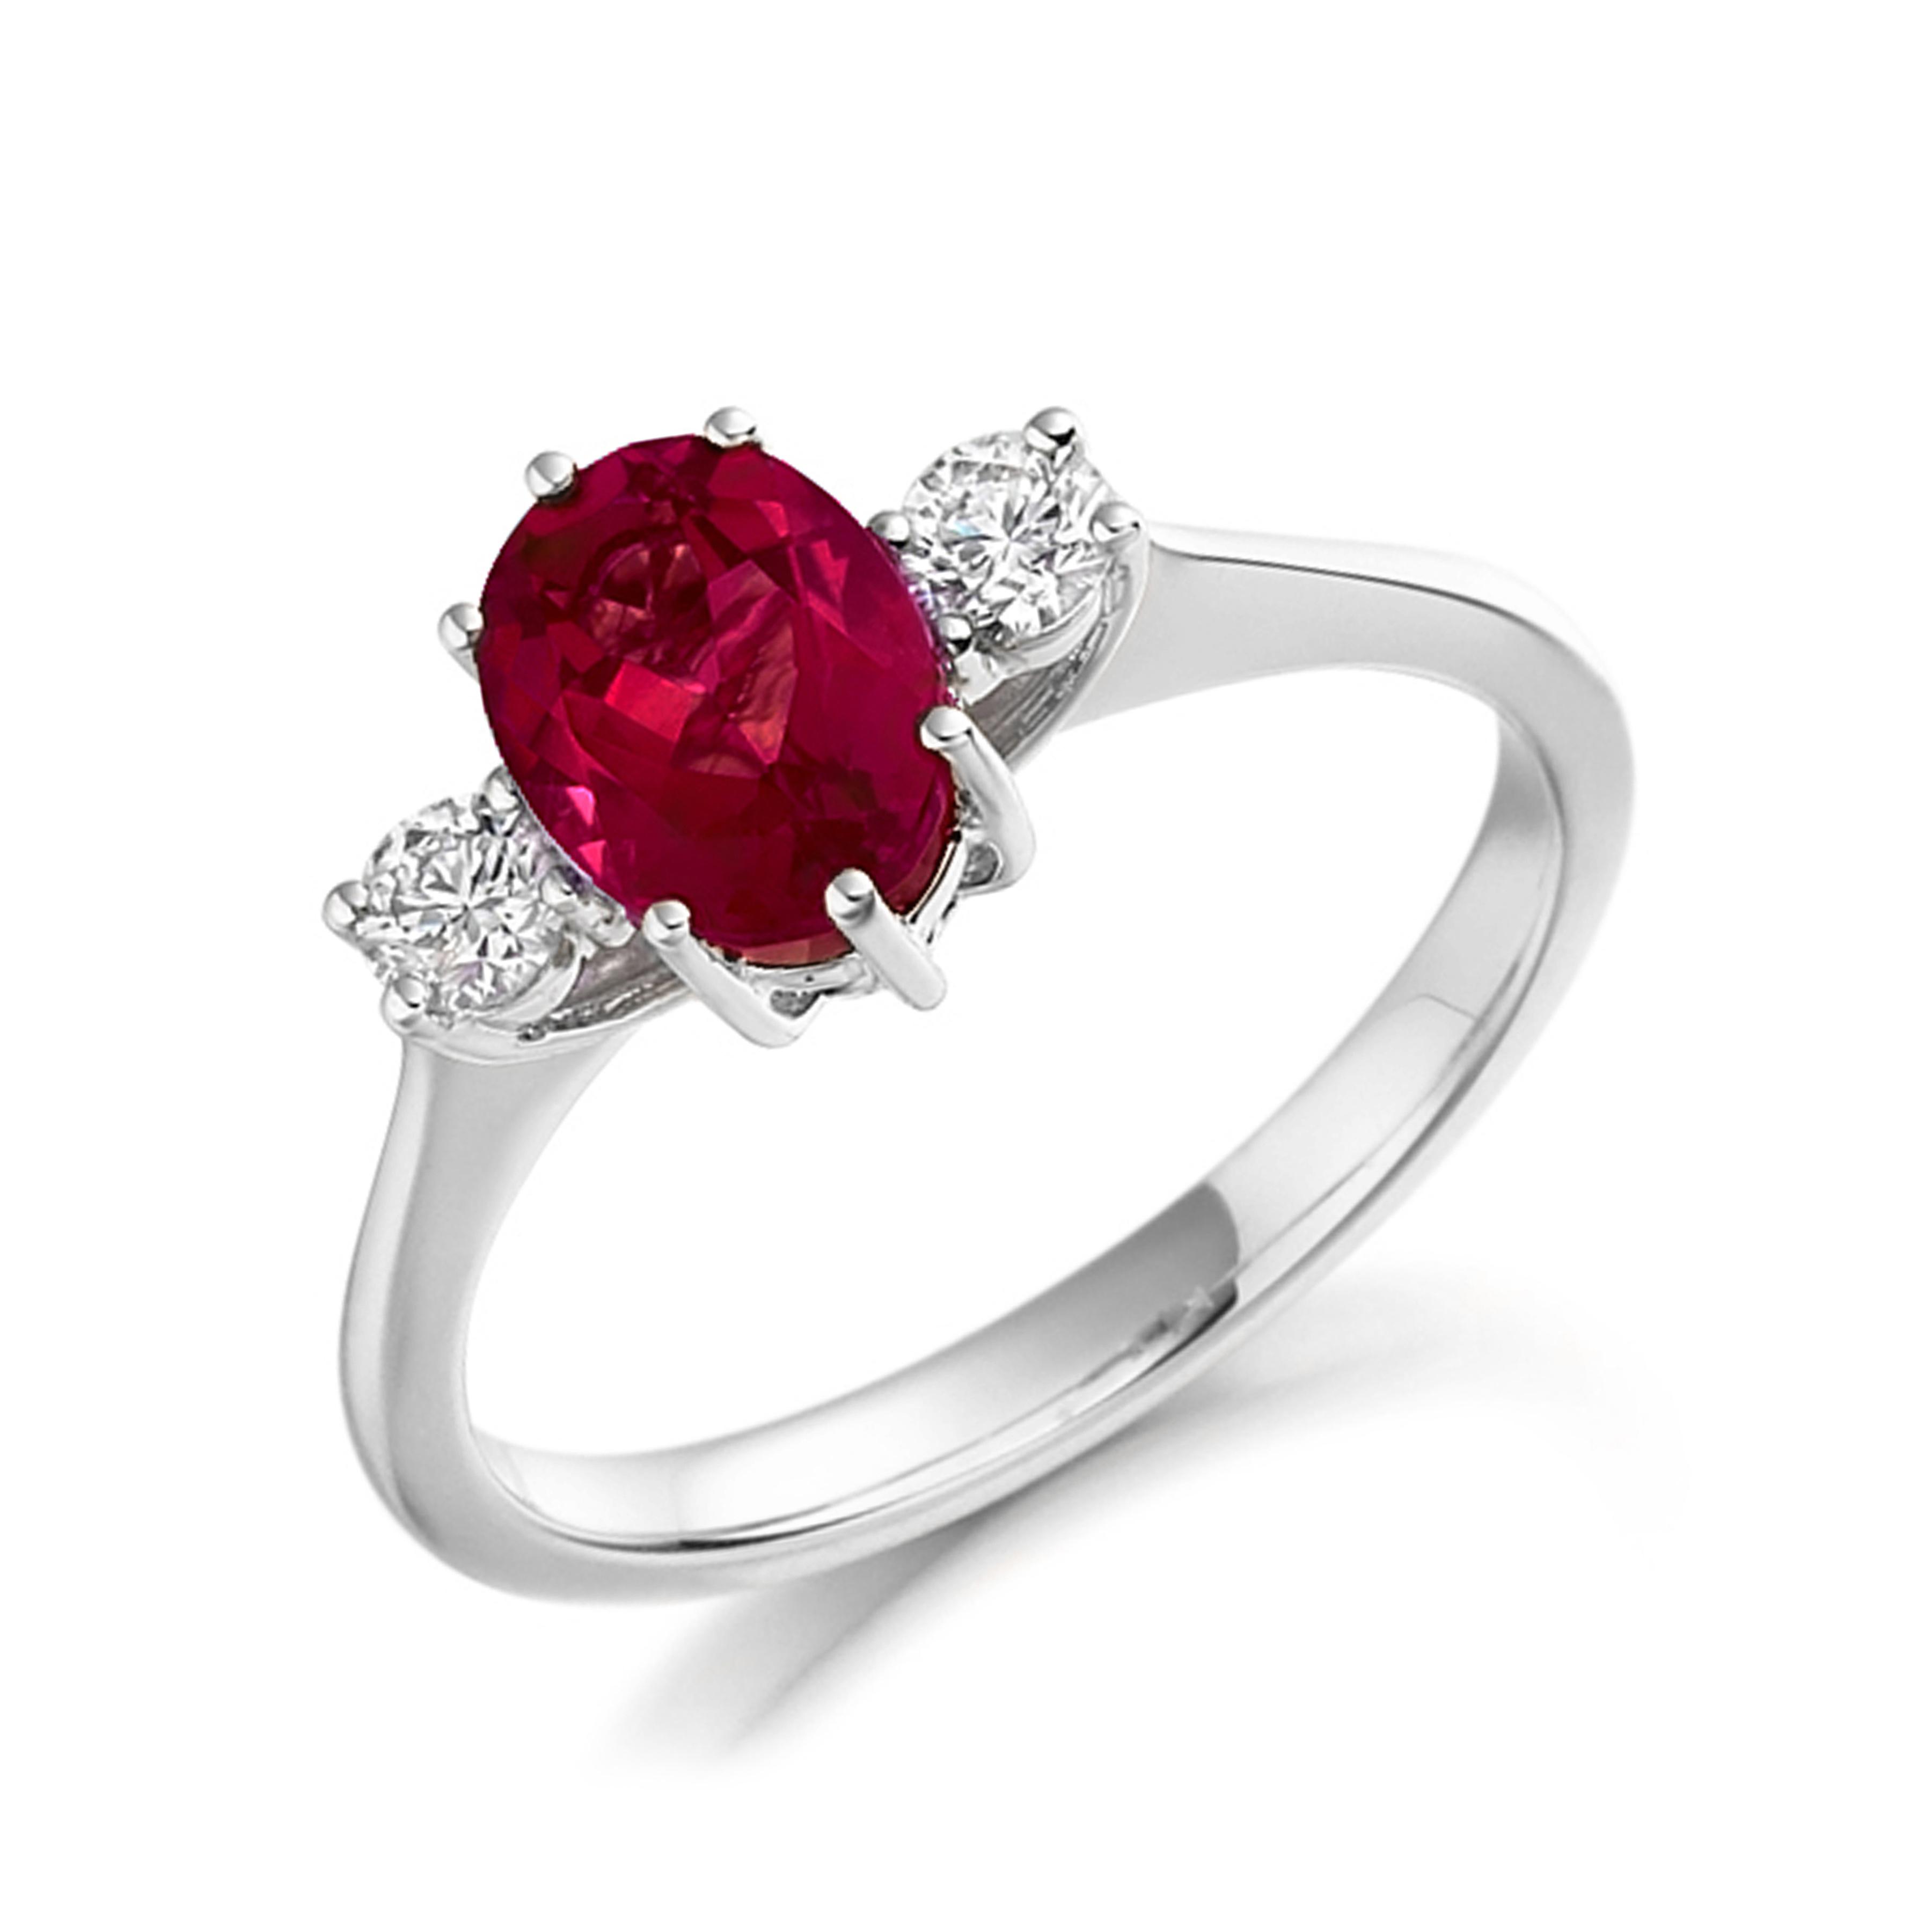 Gemstone Ring With 0.6ct Emerald Shape Tanzanite and Diamonds